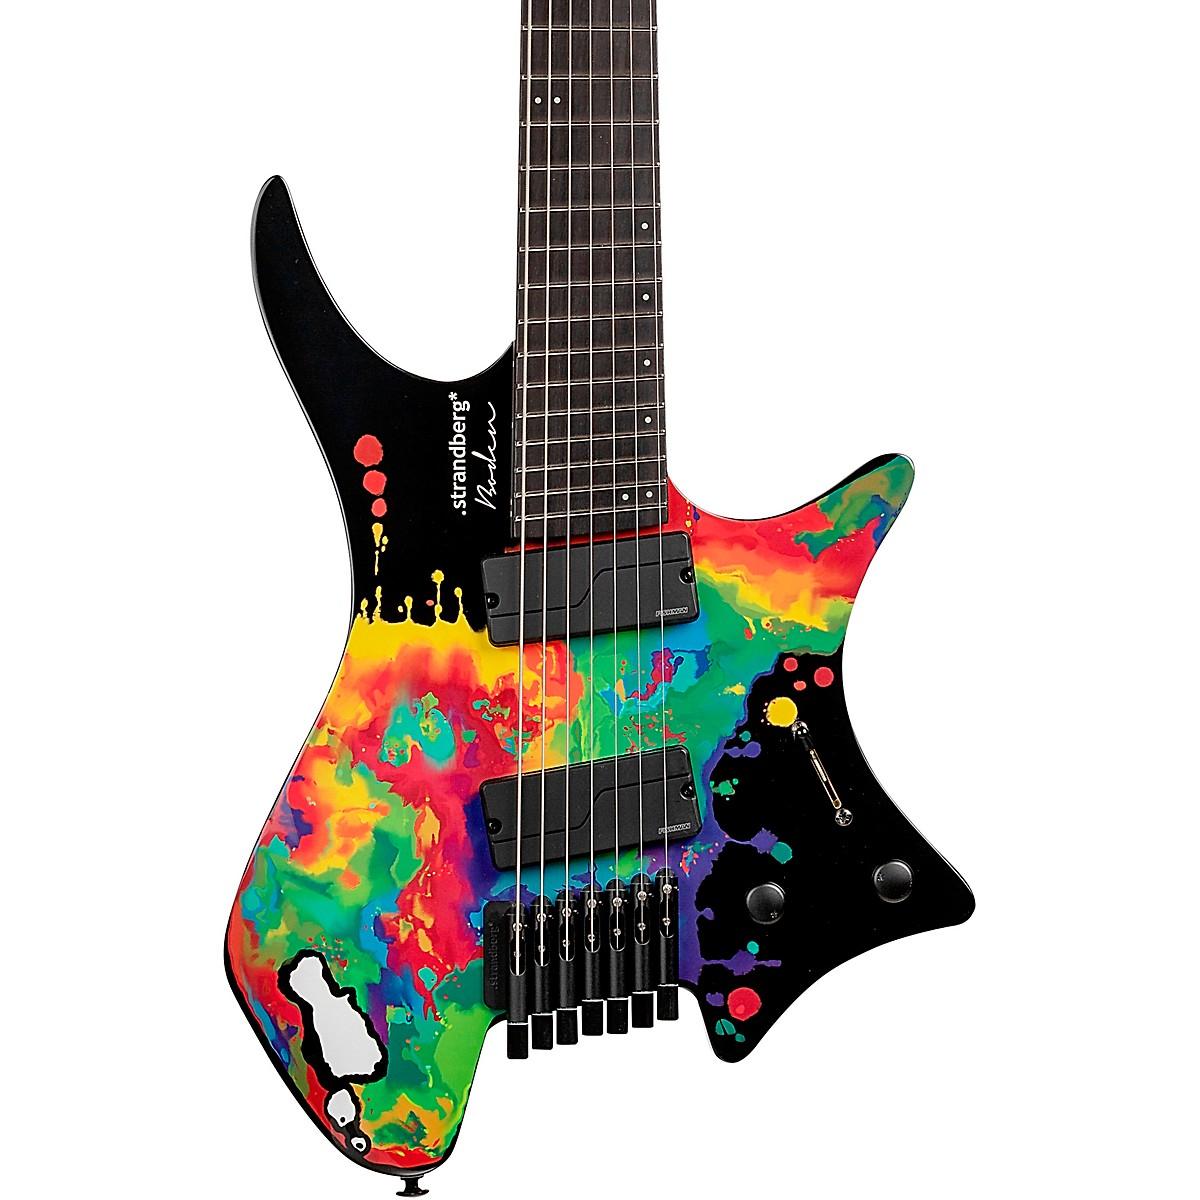 Strandberg Boden Metal 7 Sarah Longfield Edition Electric Guitar